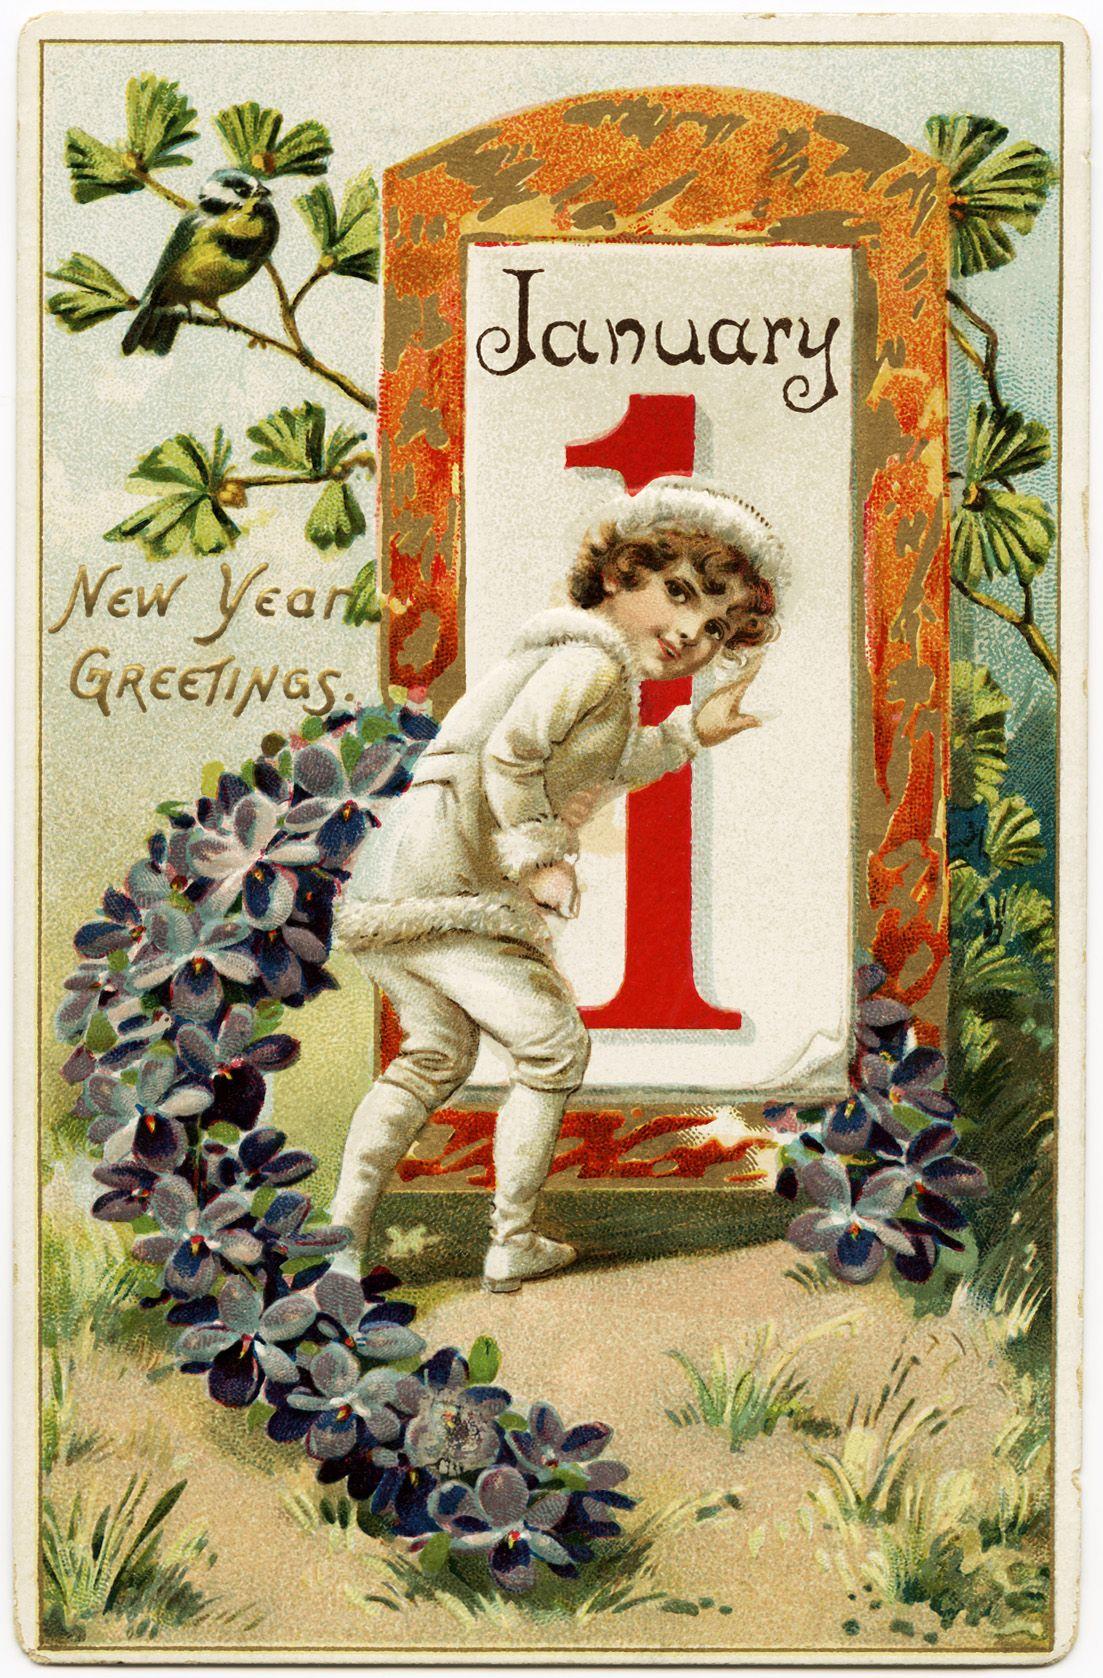 Old Design Shop Free Digital Image Vintage Tuck S New Years Postcard Vintage Happy New Year New Year Greetings New Year Postcard